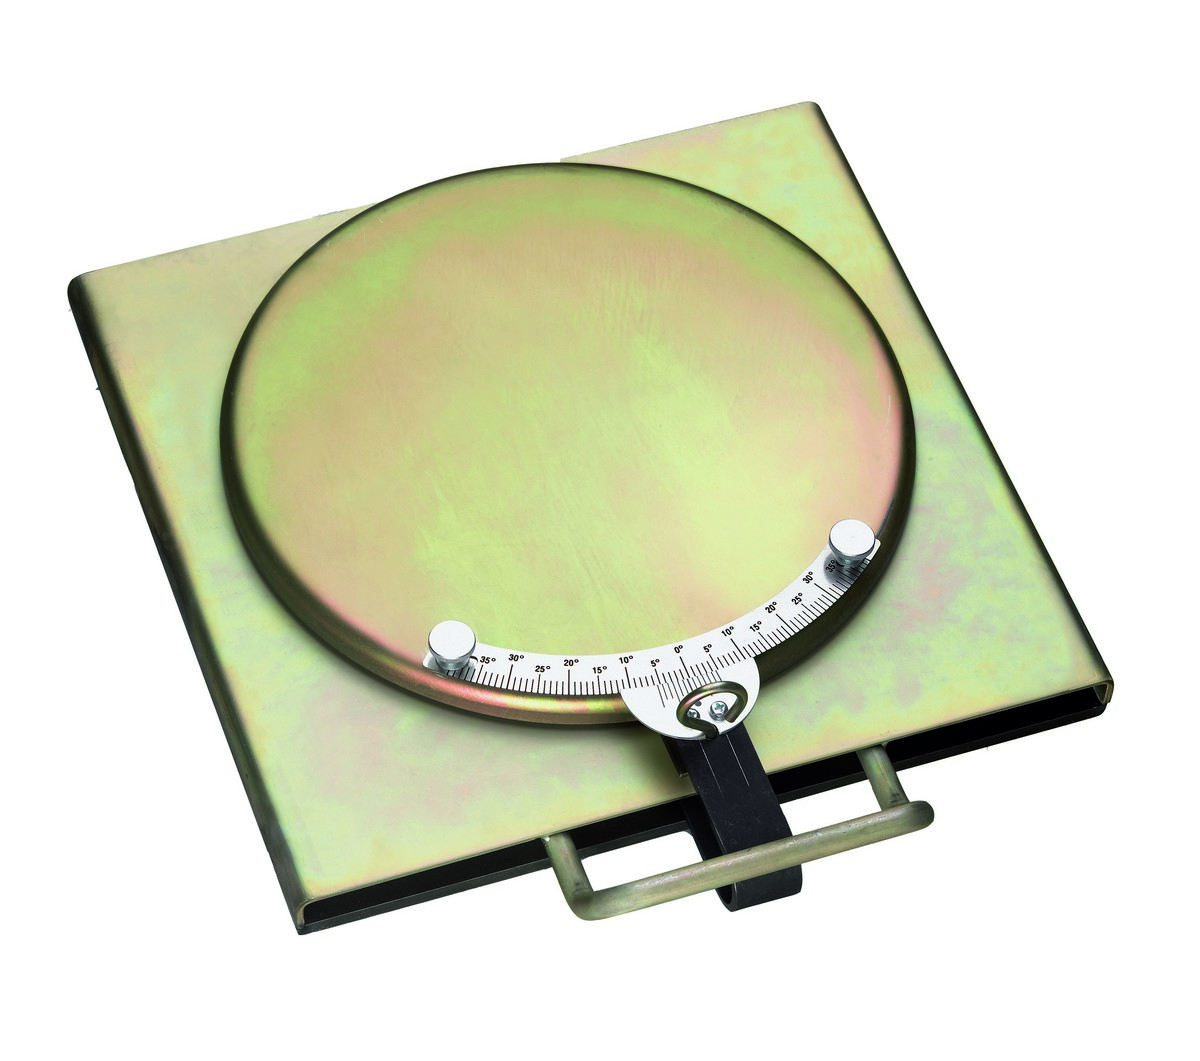 Geometria ML 1800-8 R